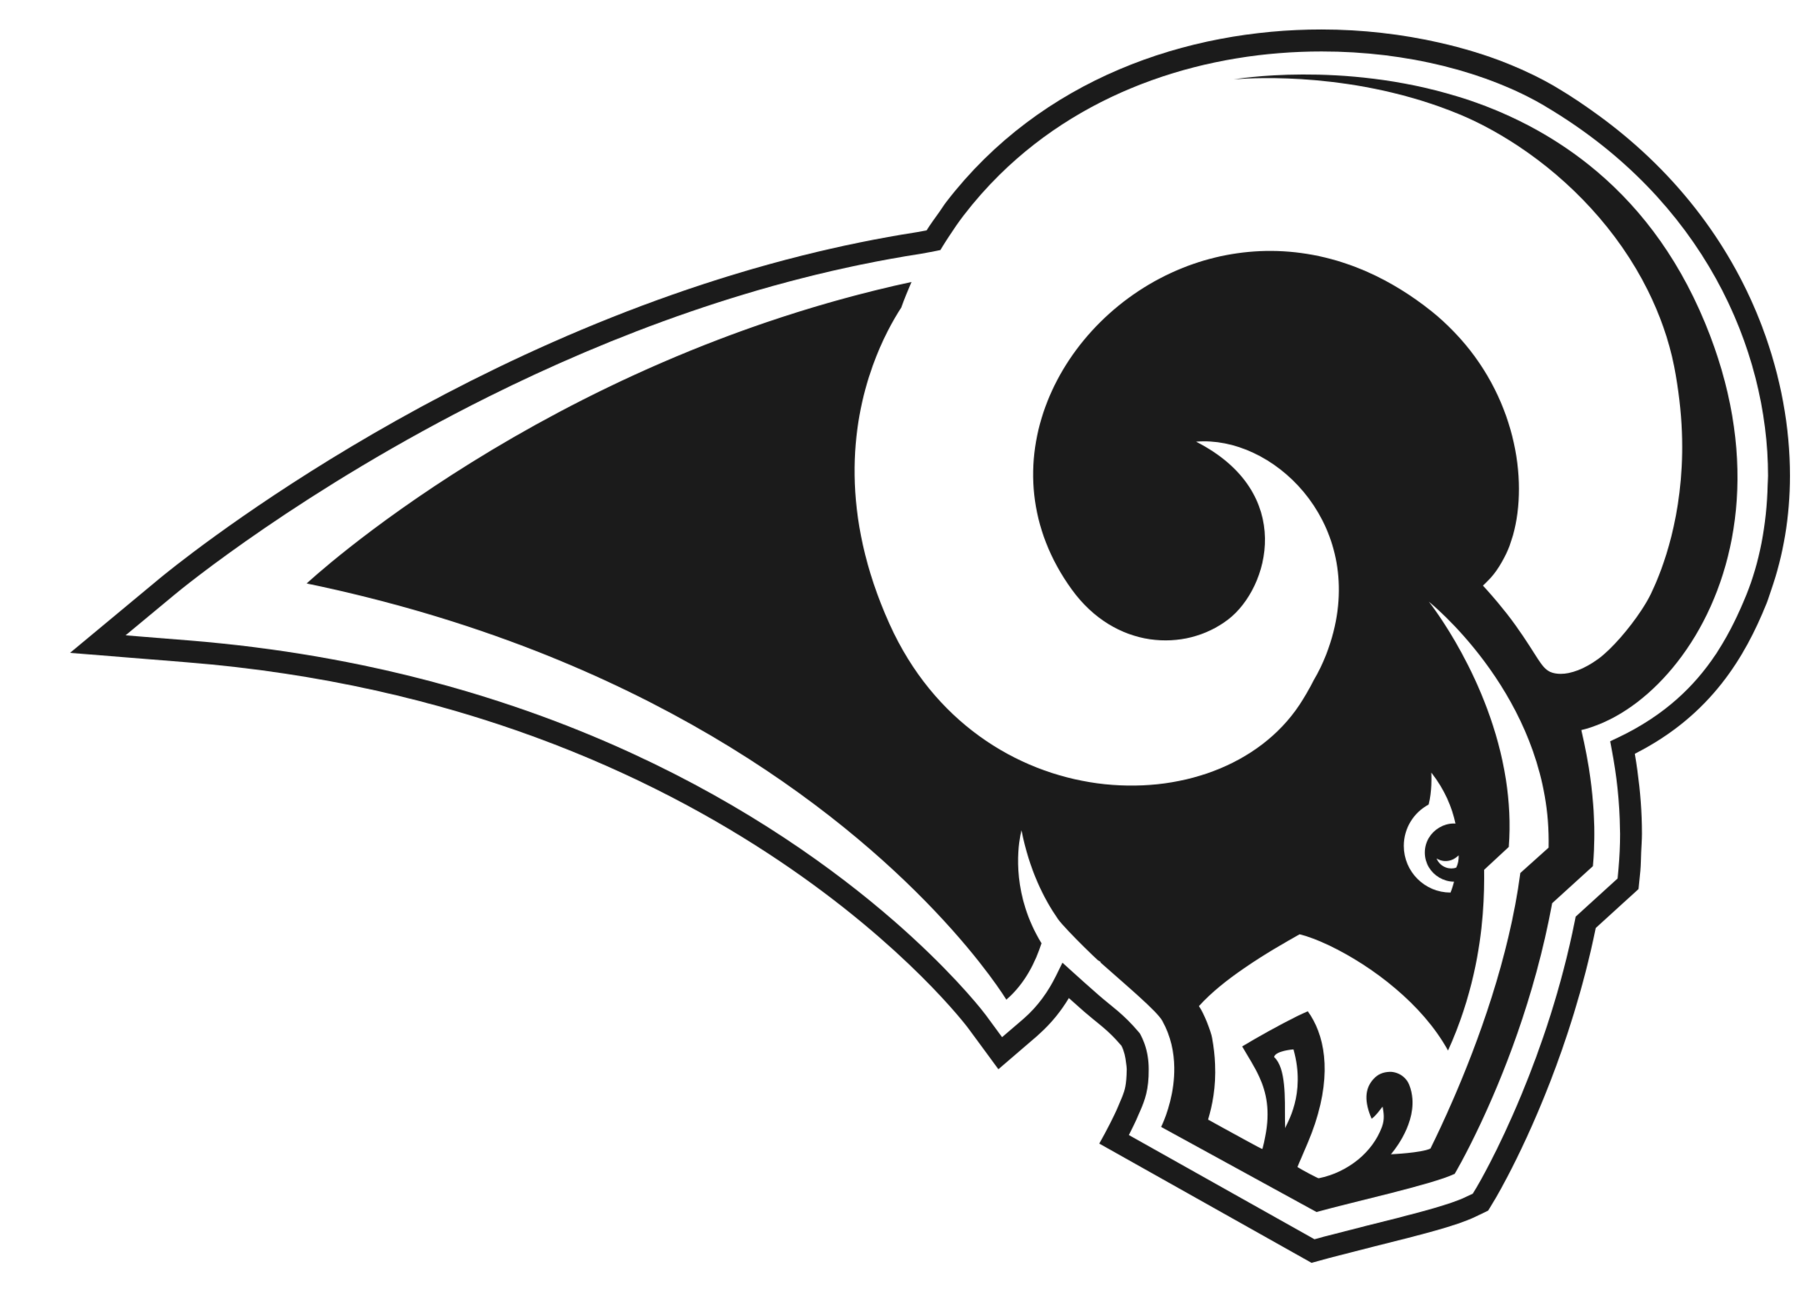 Los Angeles Rams Logo 2018 Clipart.